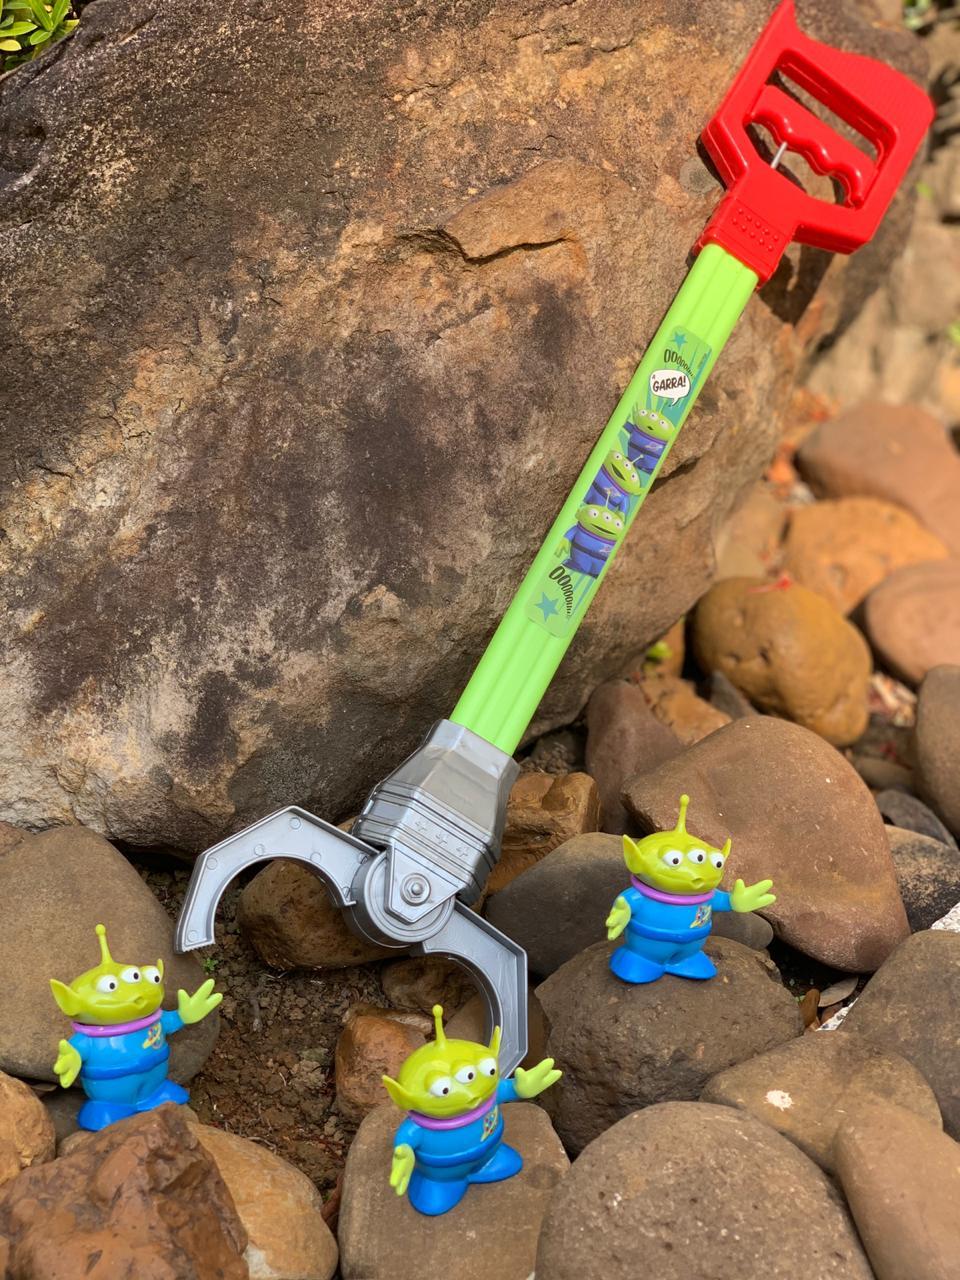 Garra Pega Aliens (Braço Biônico): Toy Story 4 (Disney) - Toyng